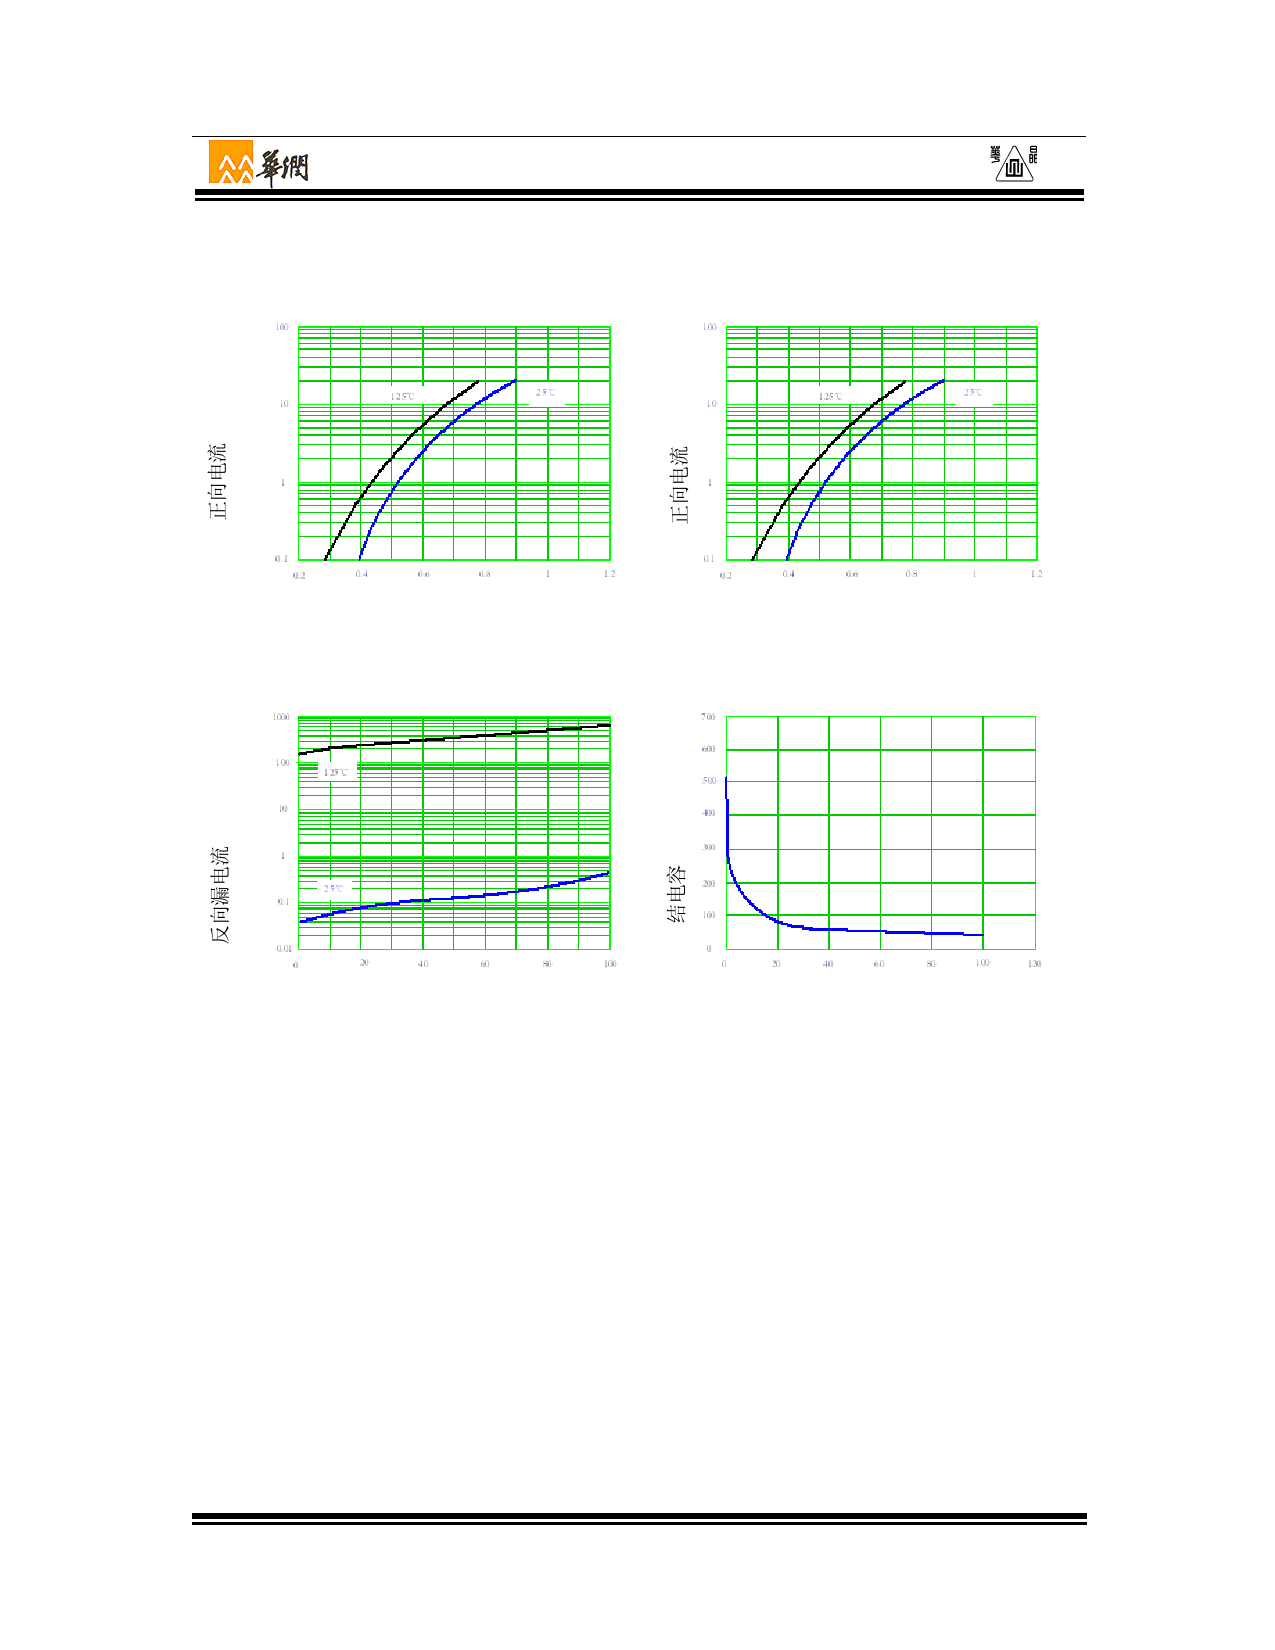 2CZ20100A8S pdf, ピン配列